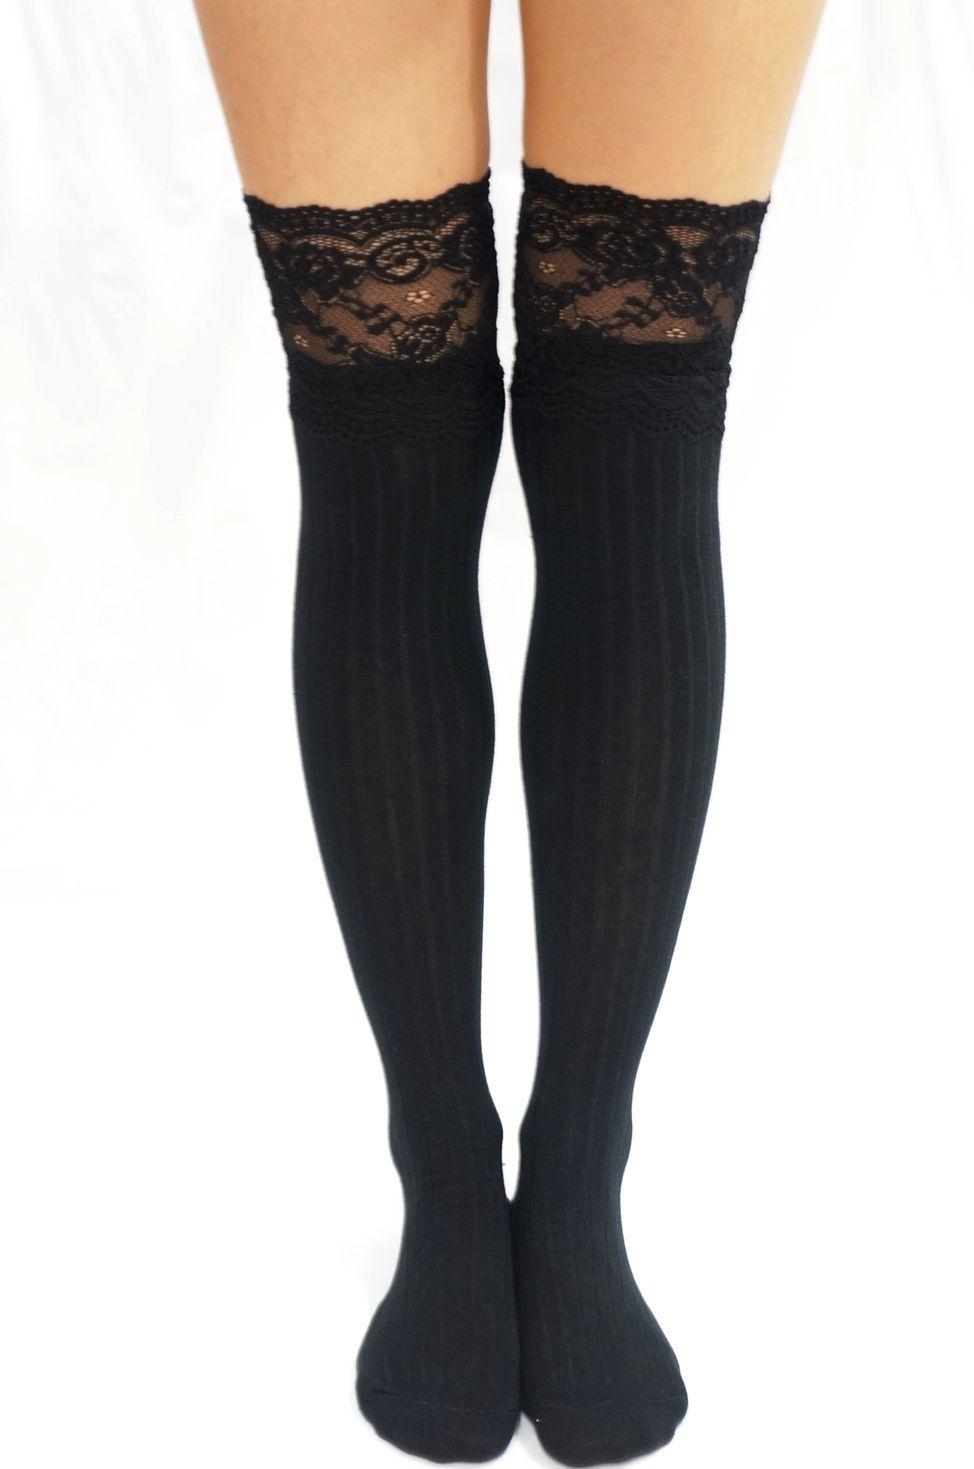 e9e9851f708d62 Thigh Lace Knit Knee High socks Boot socks -Black from Sandysshop ...